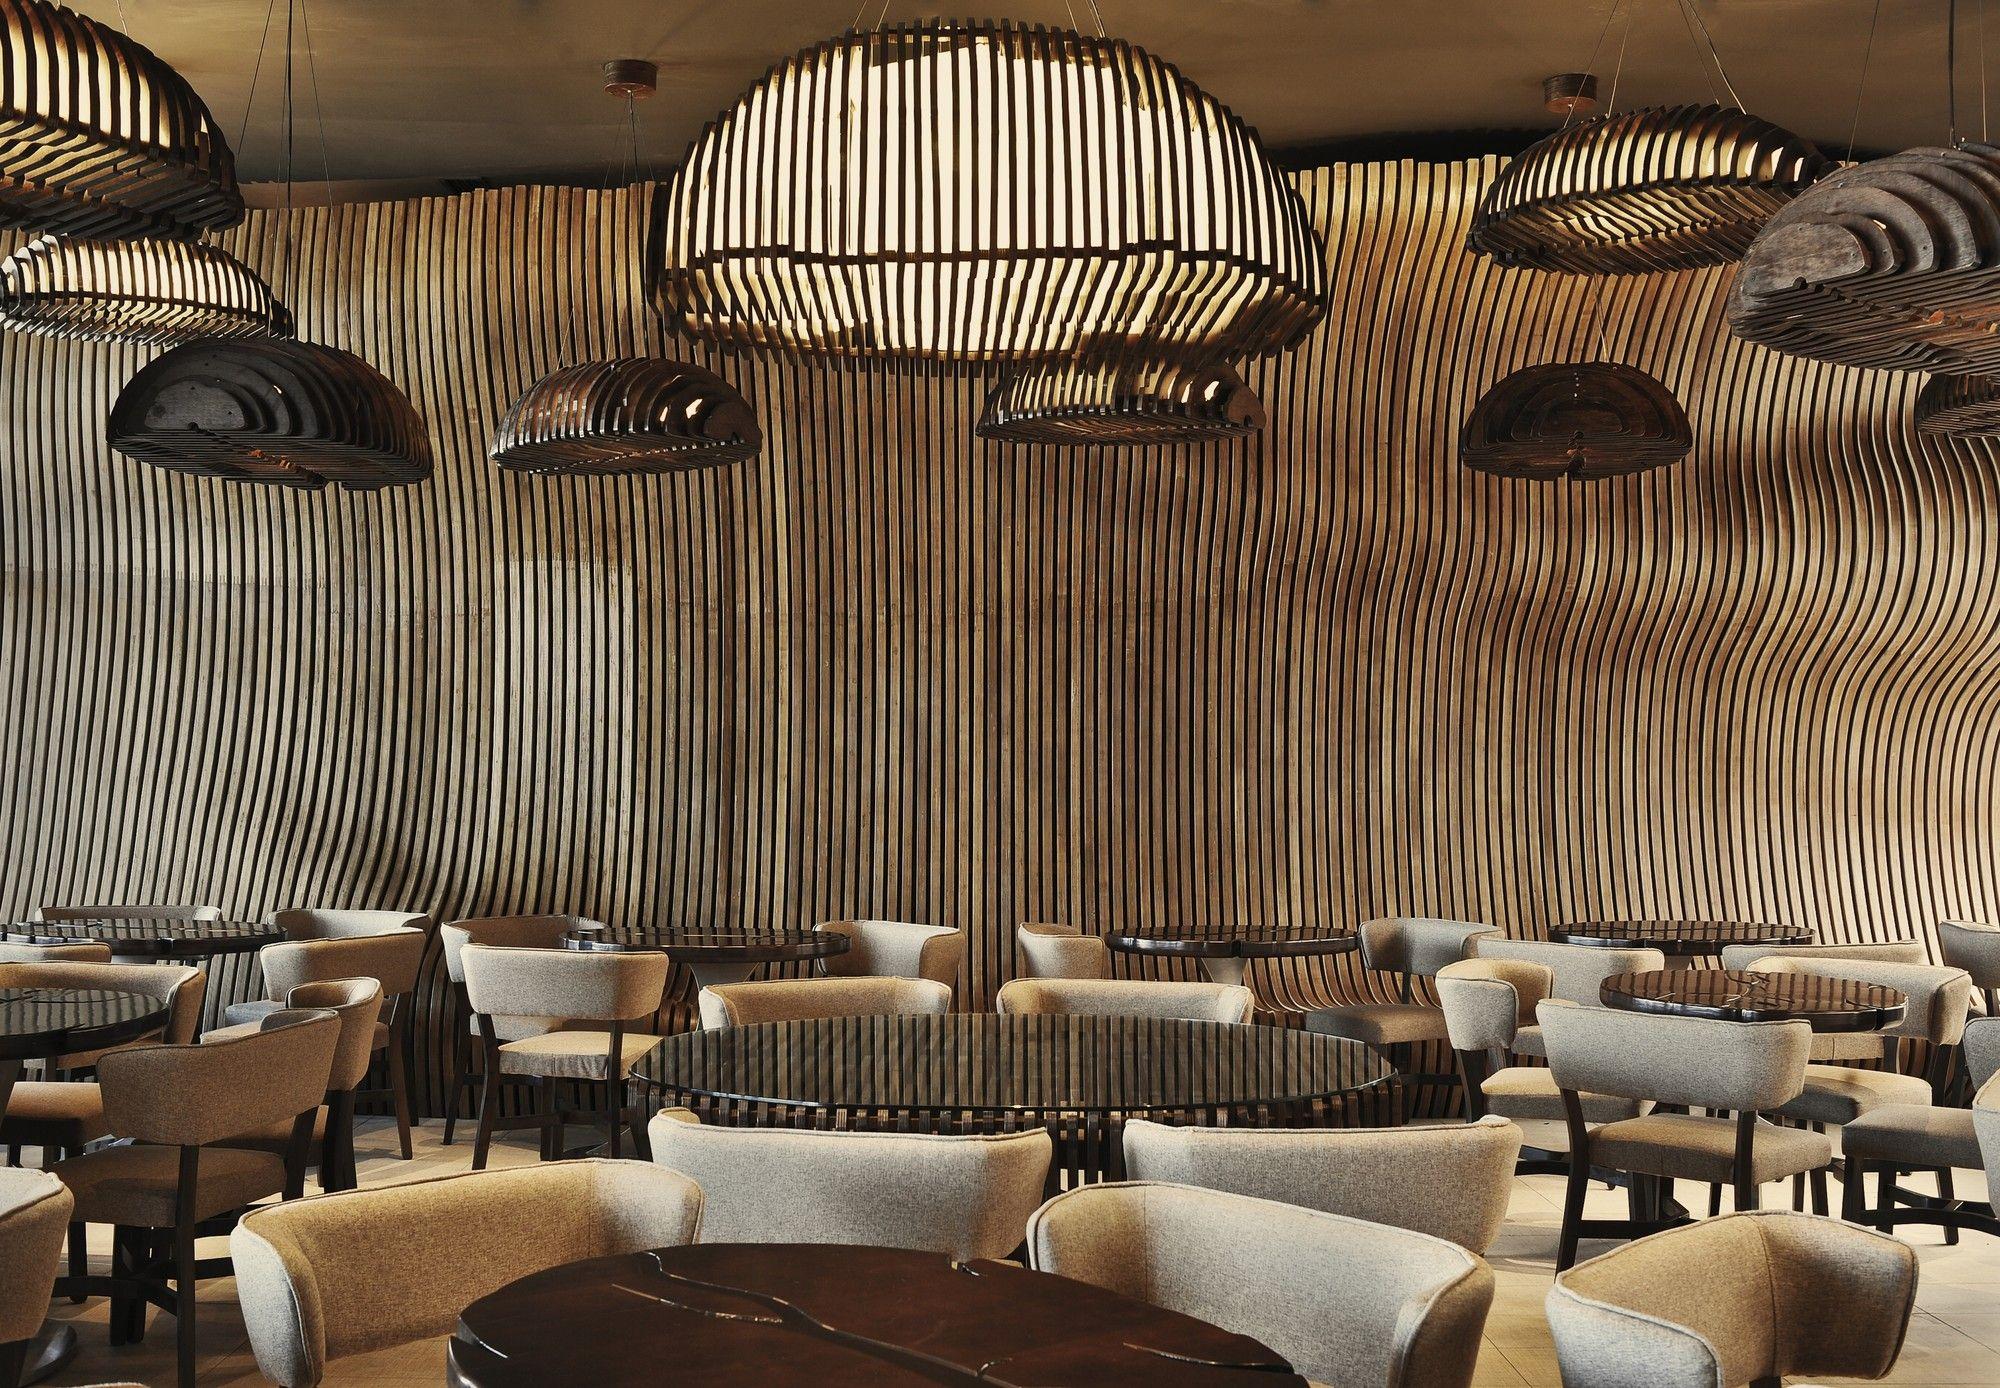 Innarch Have Designed The Don Caf House In Pristina, Kosovo